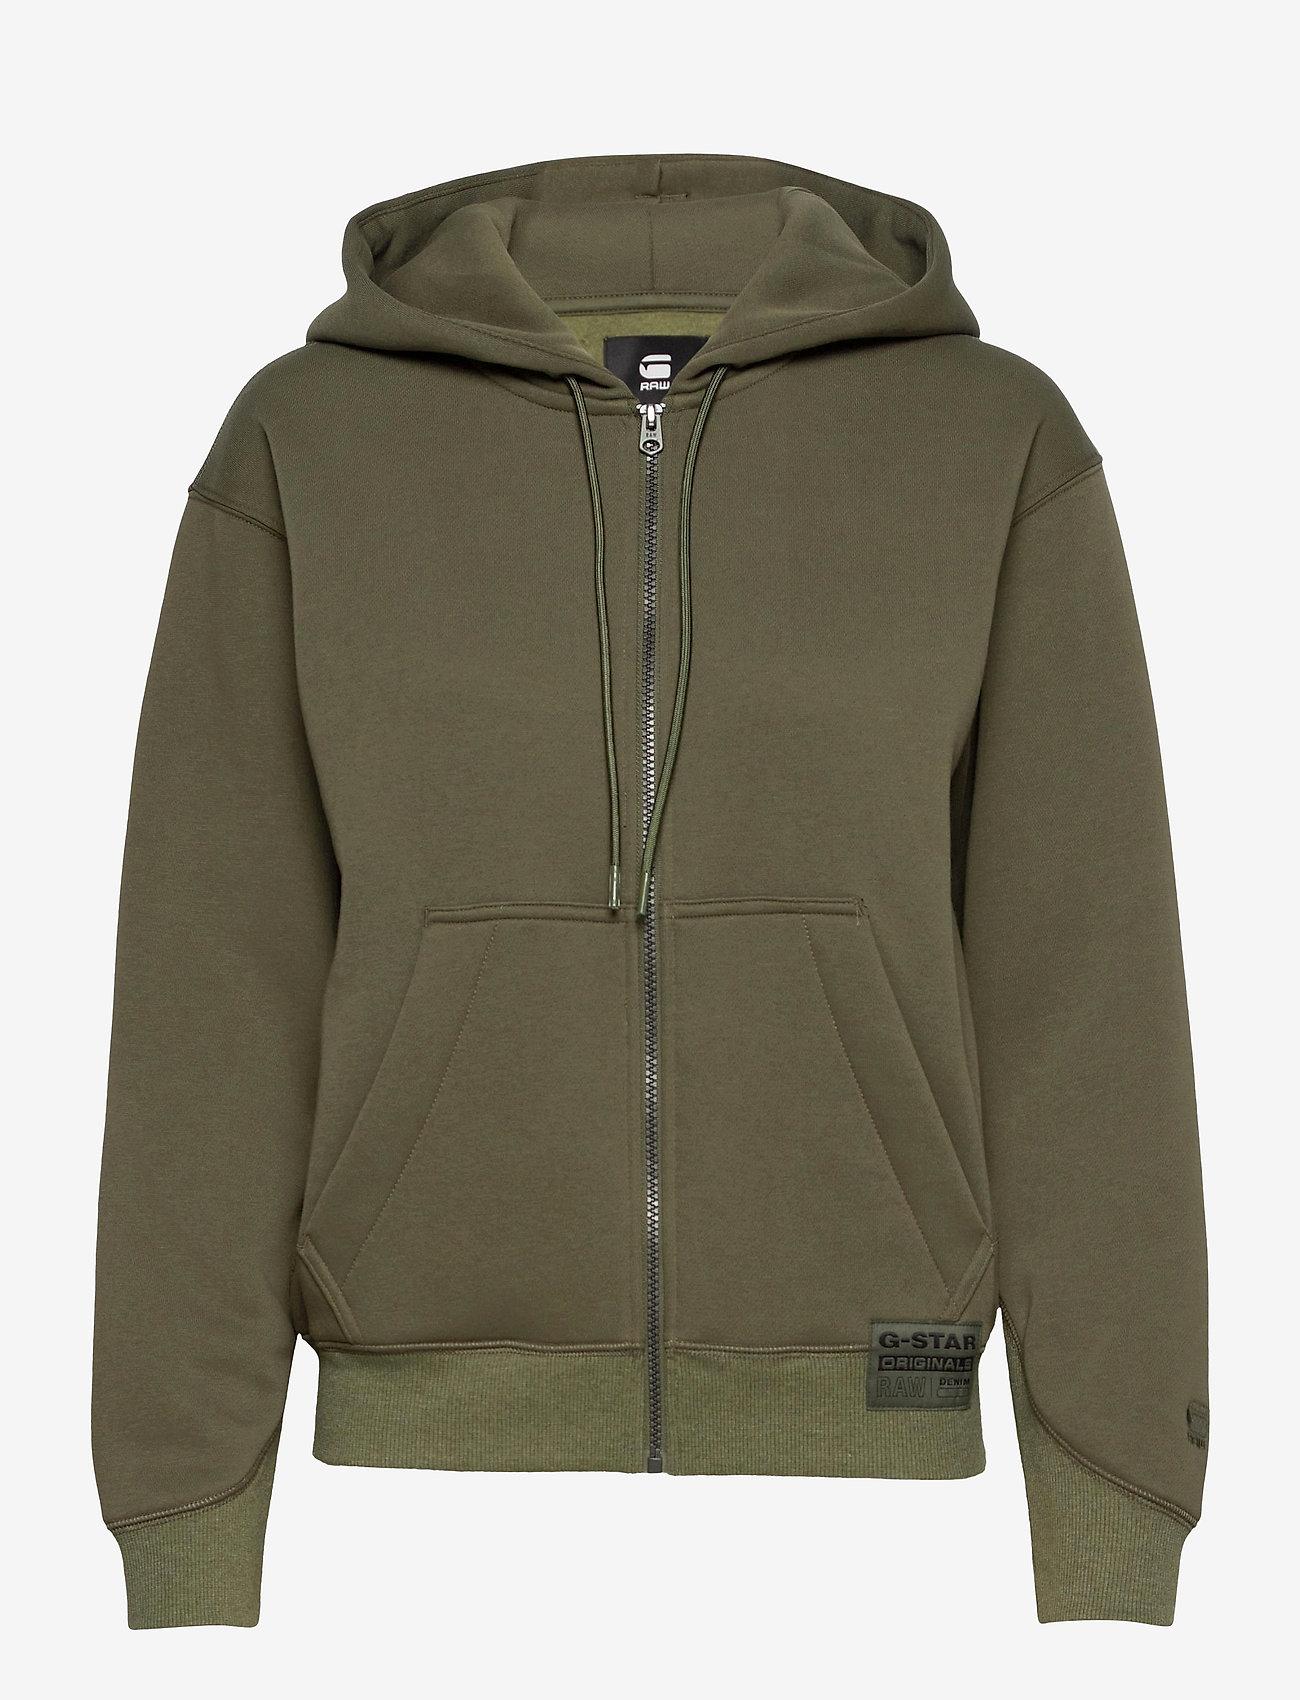 G-star RAW - Premium core hdd zip thru sw wmn l- - hoodies - combat - 0